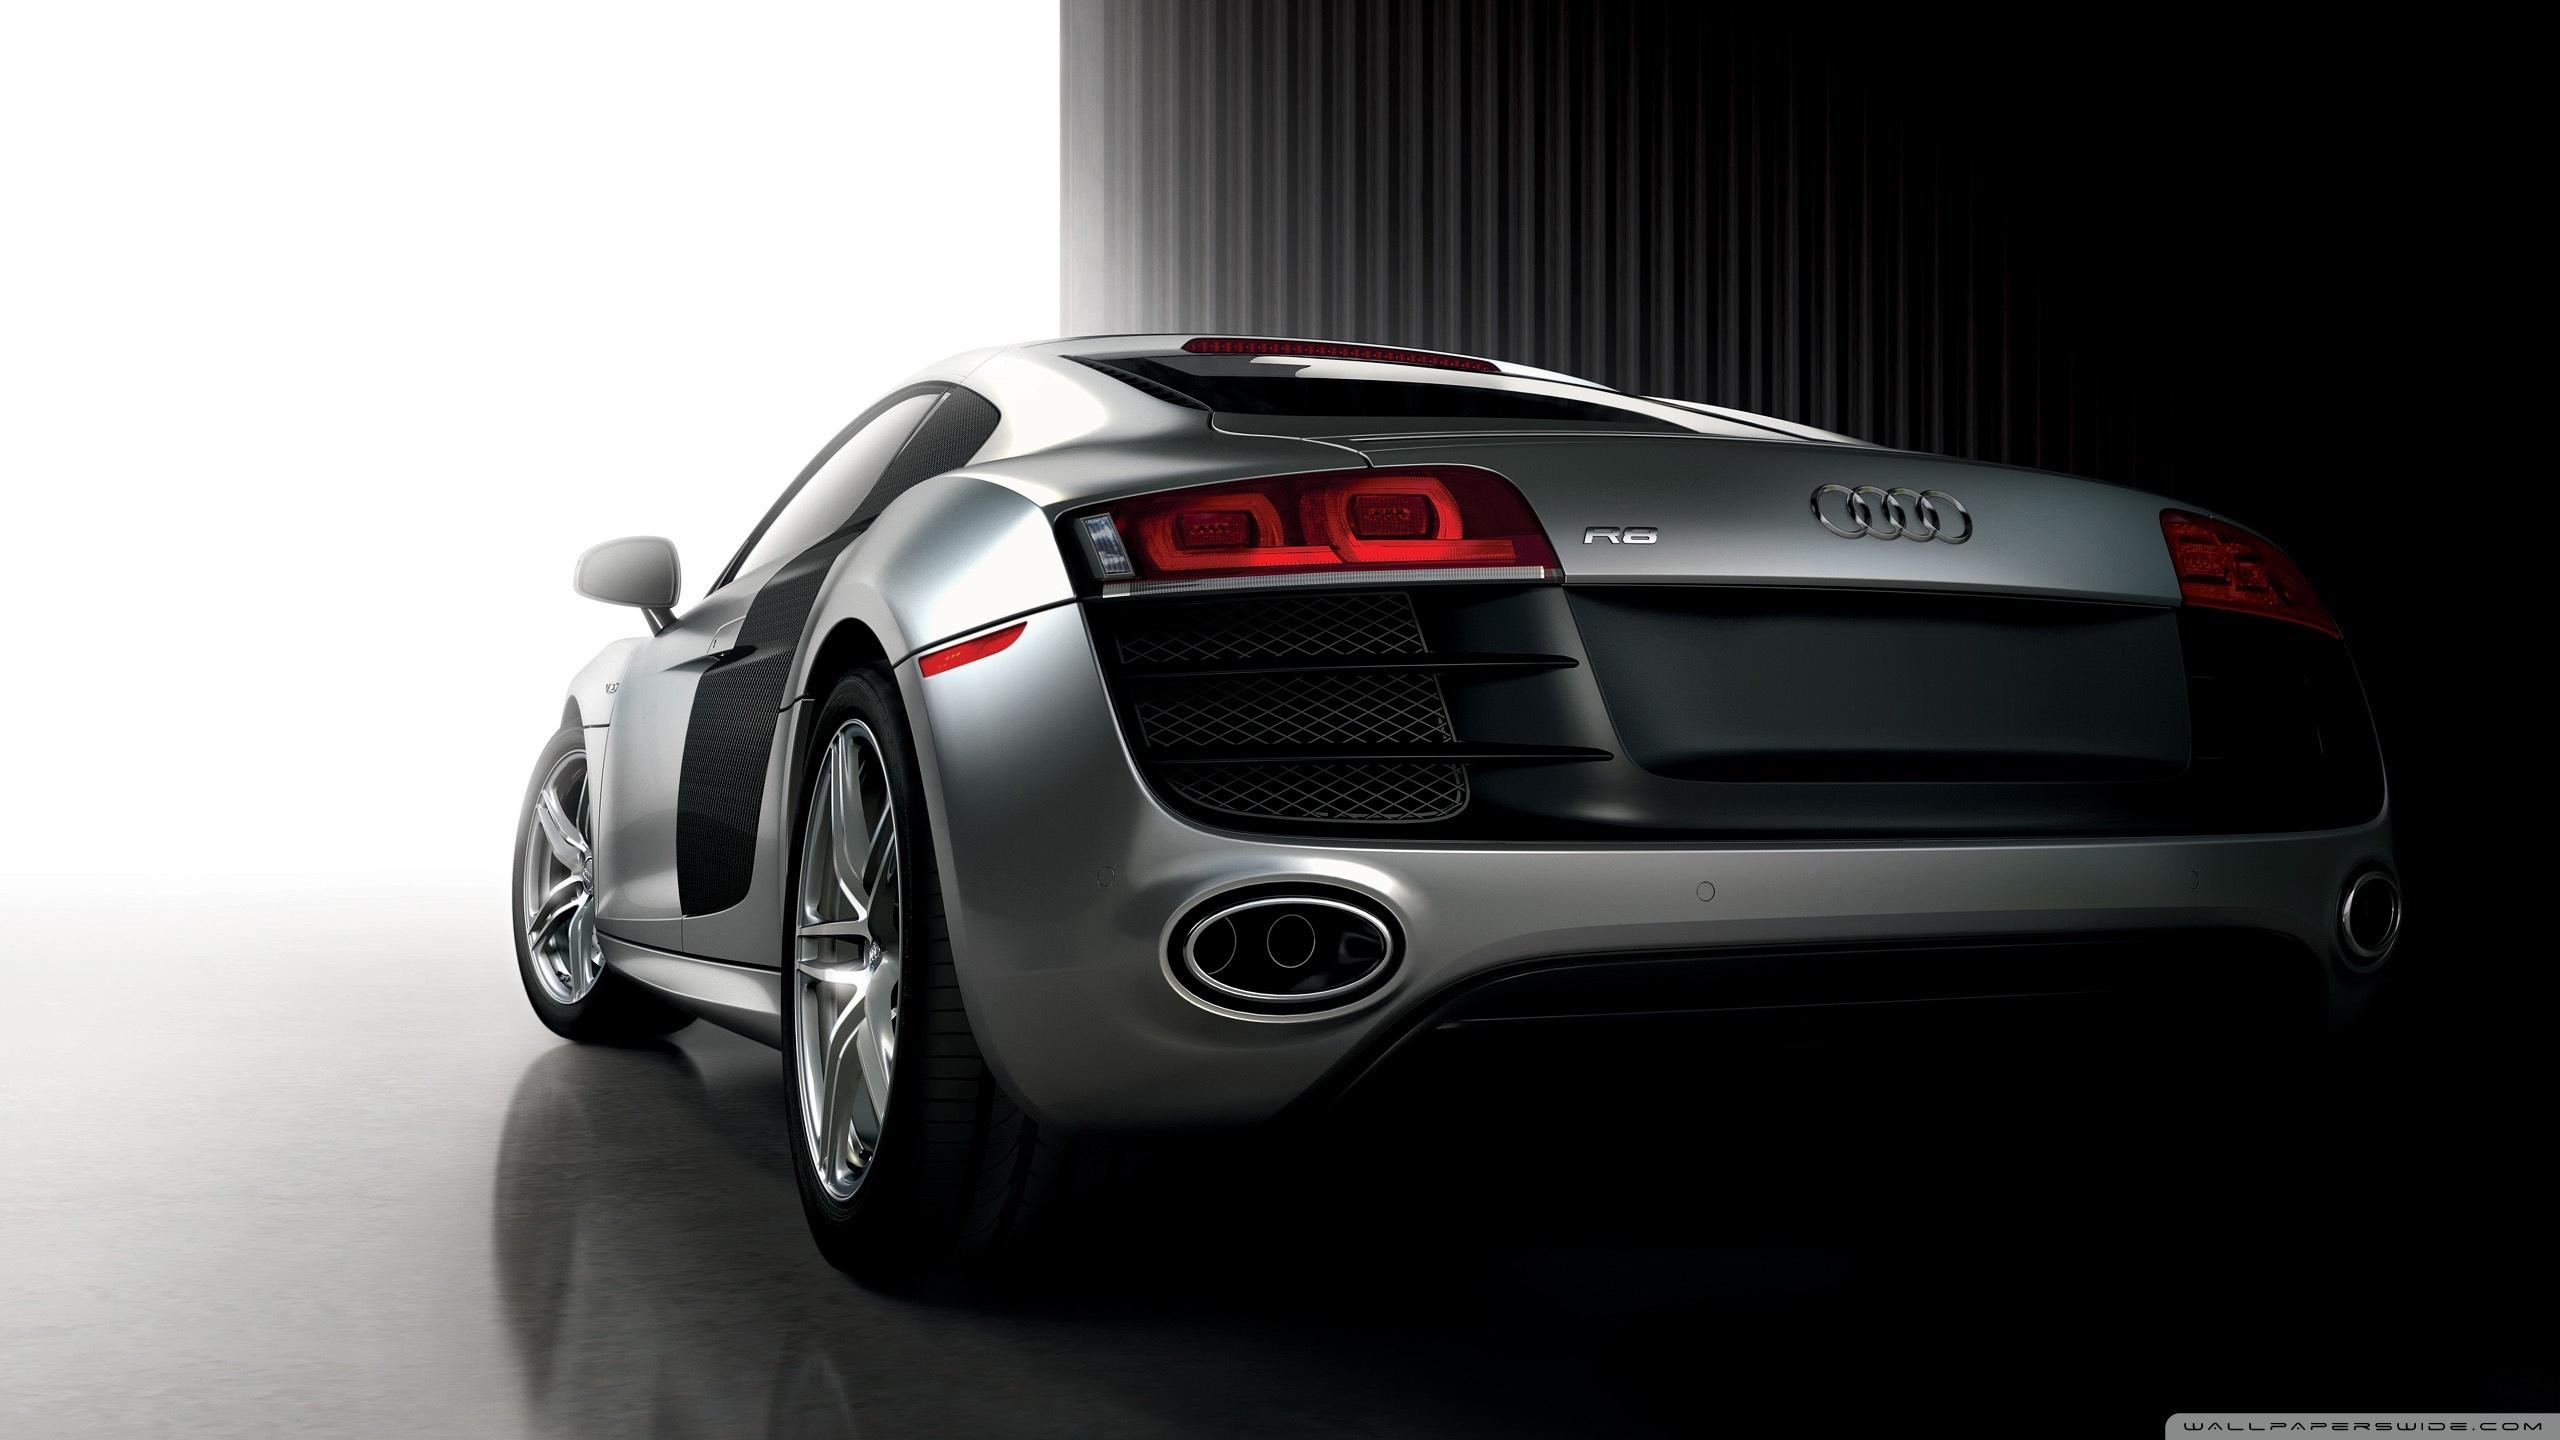 WallpapersWide com | Audi HD Desktop Wallpapers for Widescreen